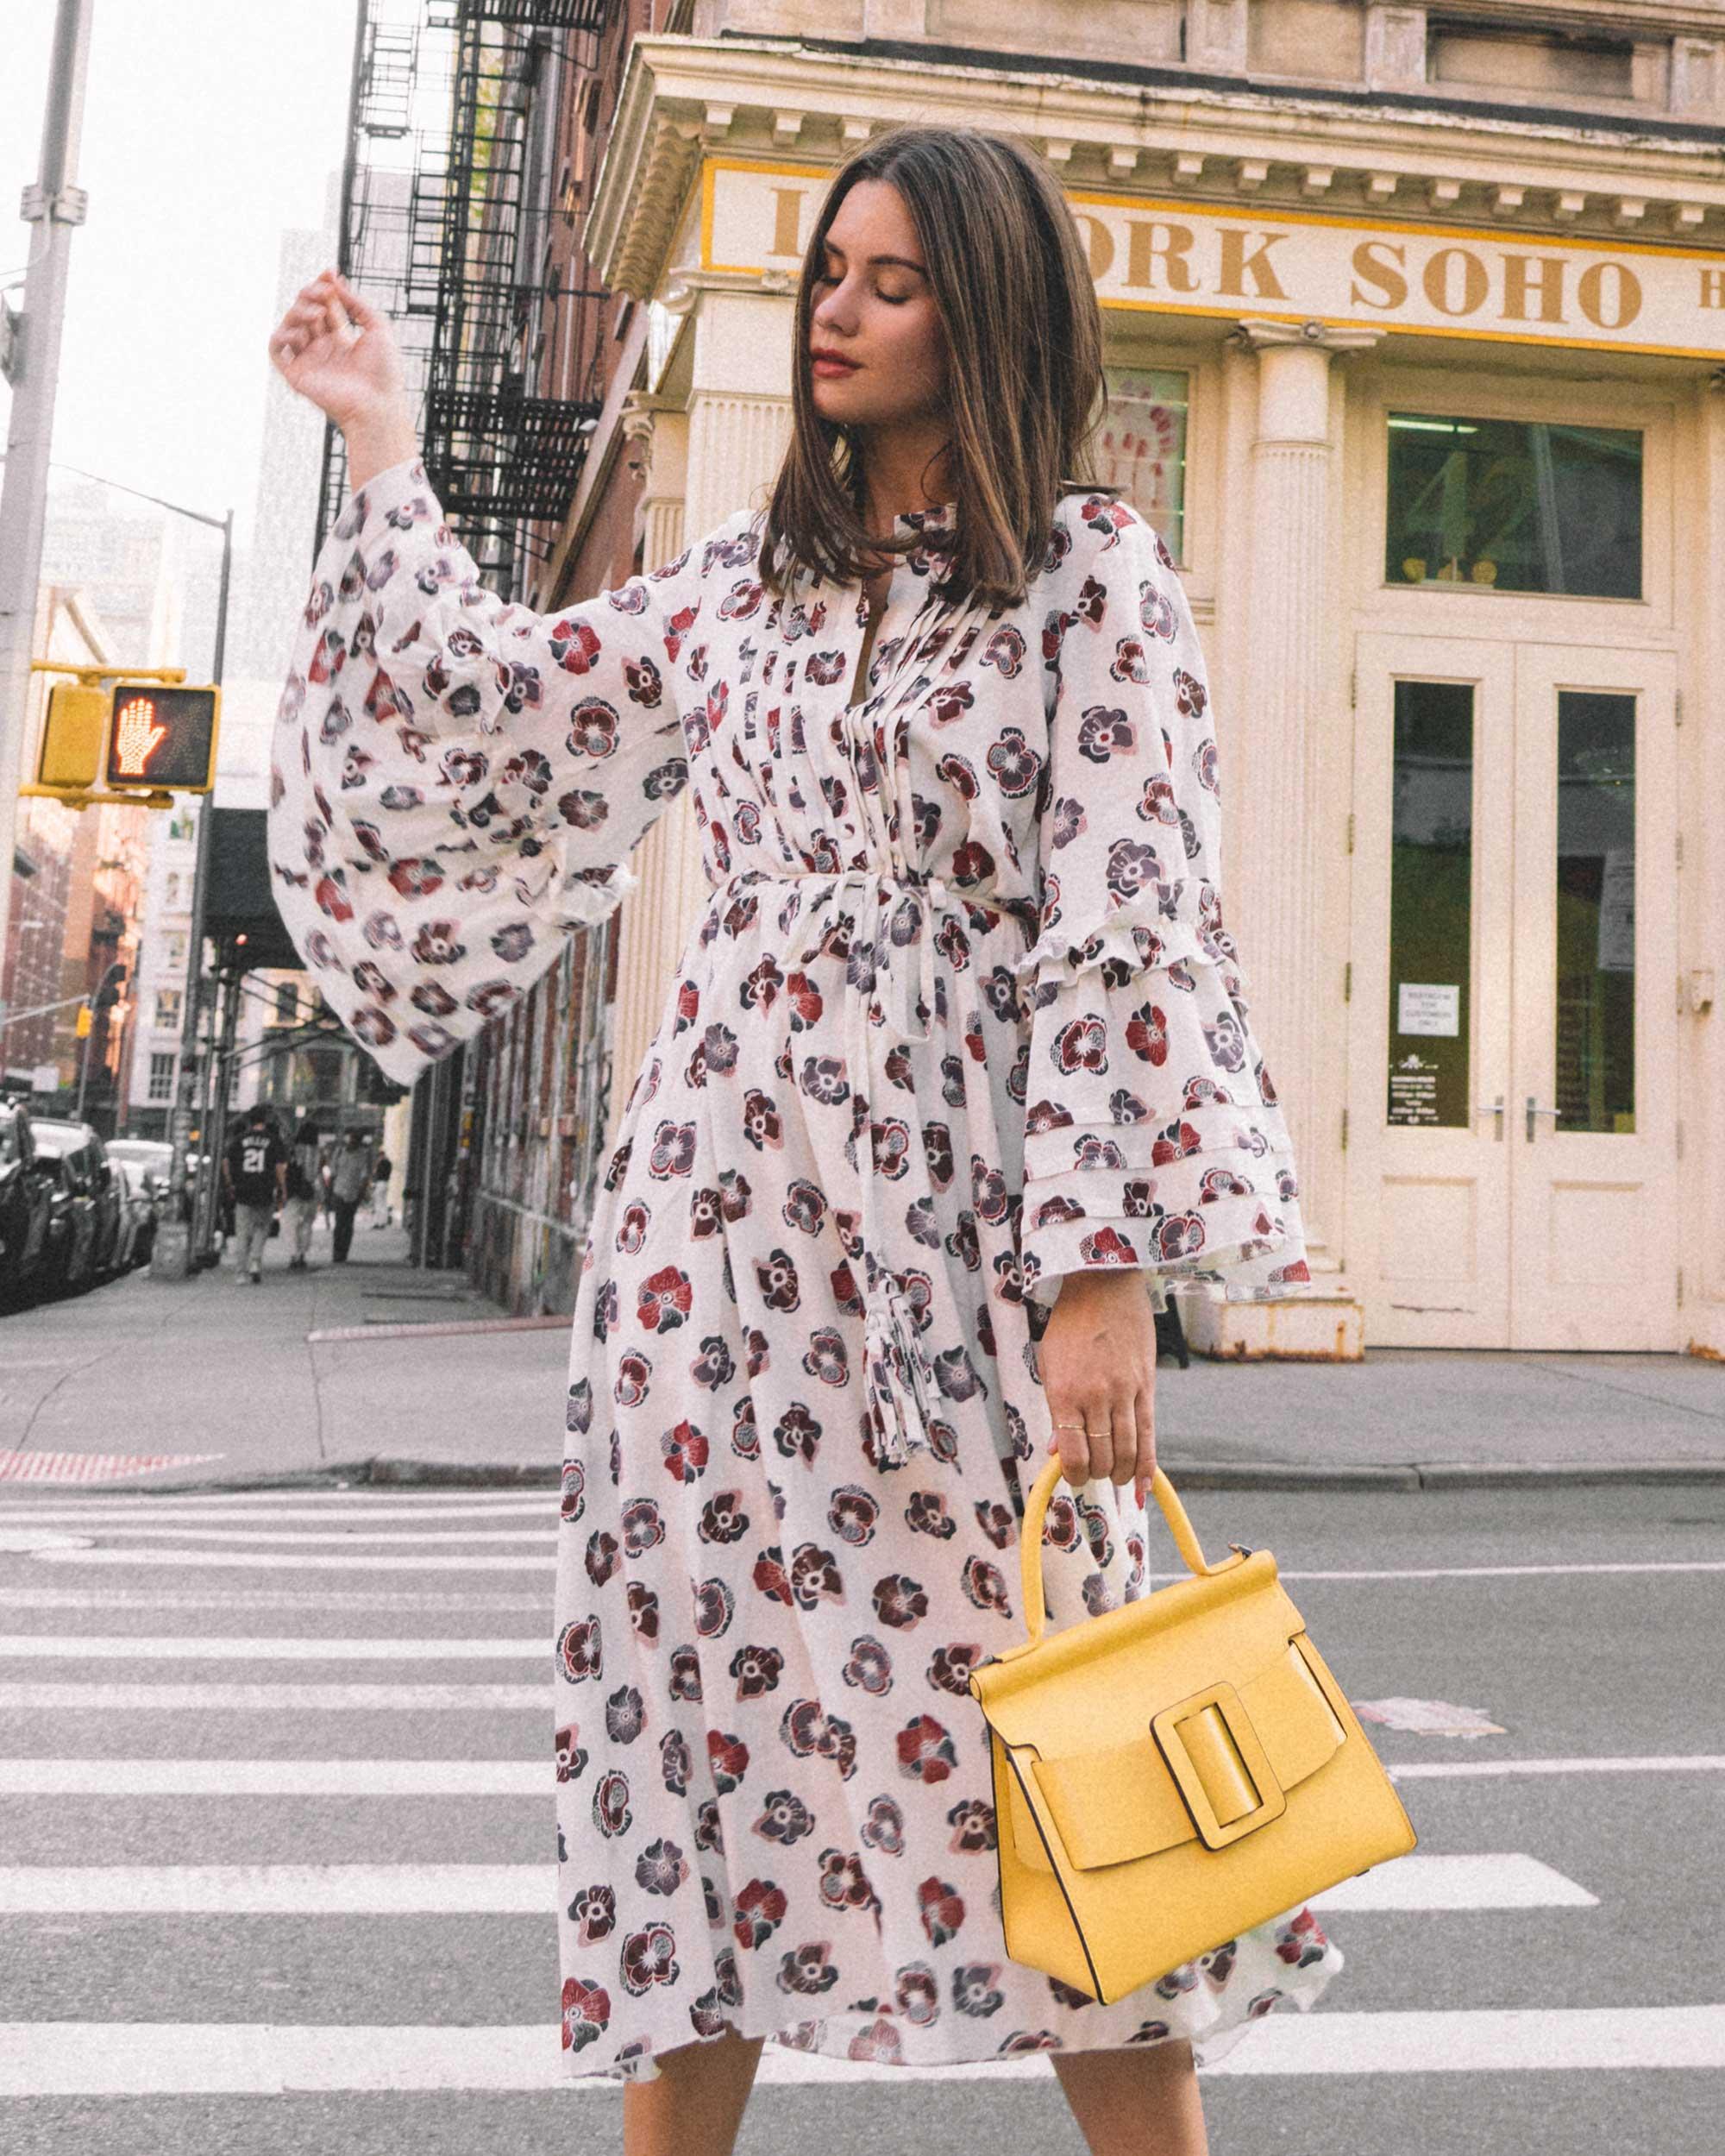 Madewell x Karen Walker Floral Fantasia Ruffled Dress and BOYY Karl 24 Bag soho new york fashion week outfit2.jpg